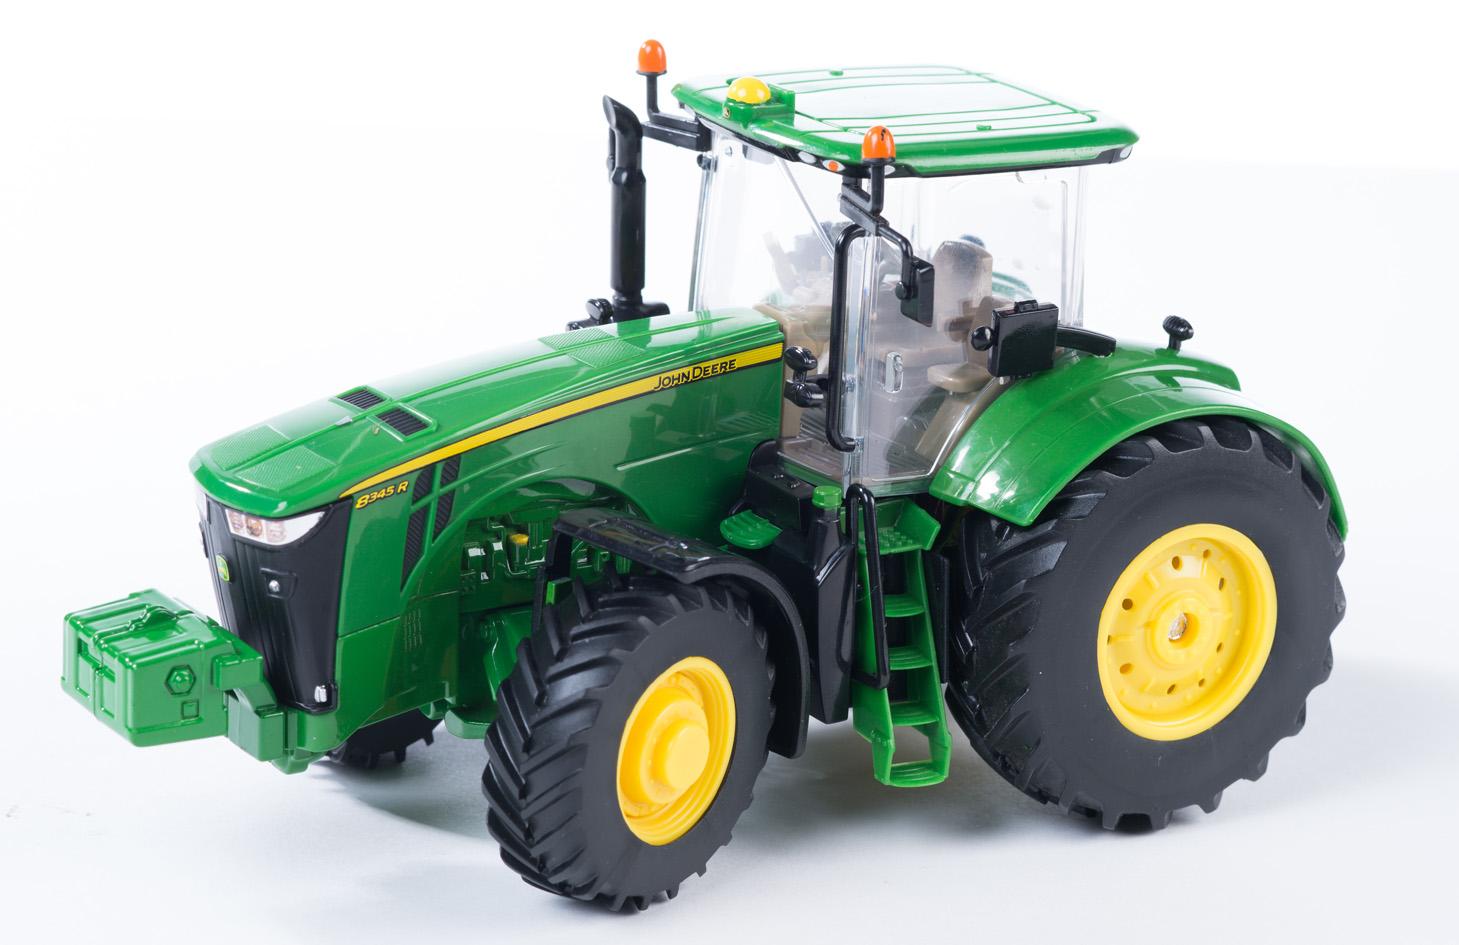 BRITAINS 42999 John Deere 8370R Tractor